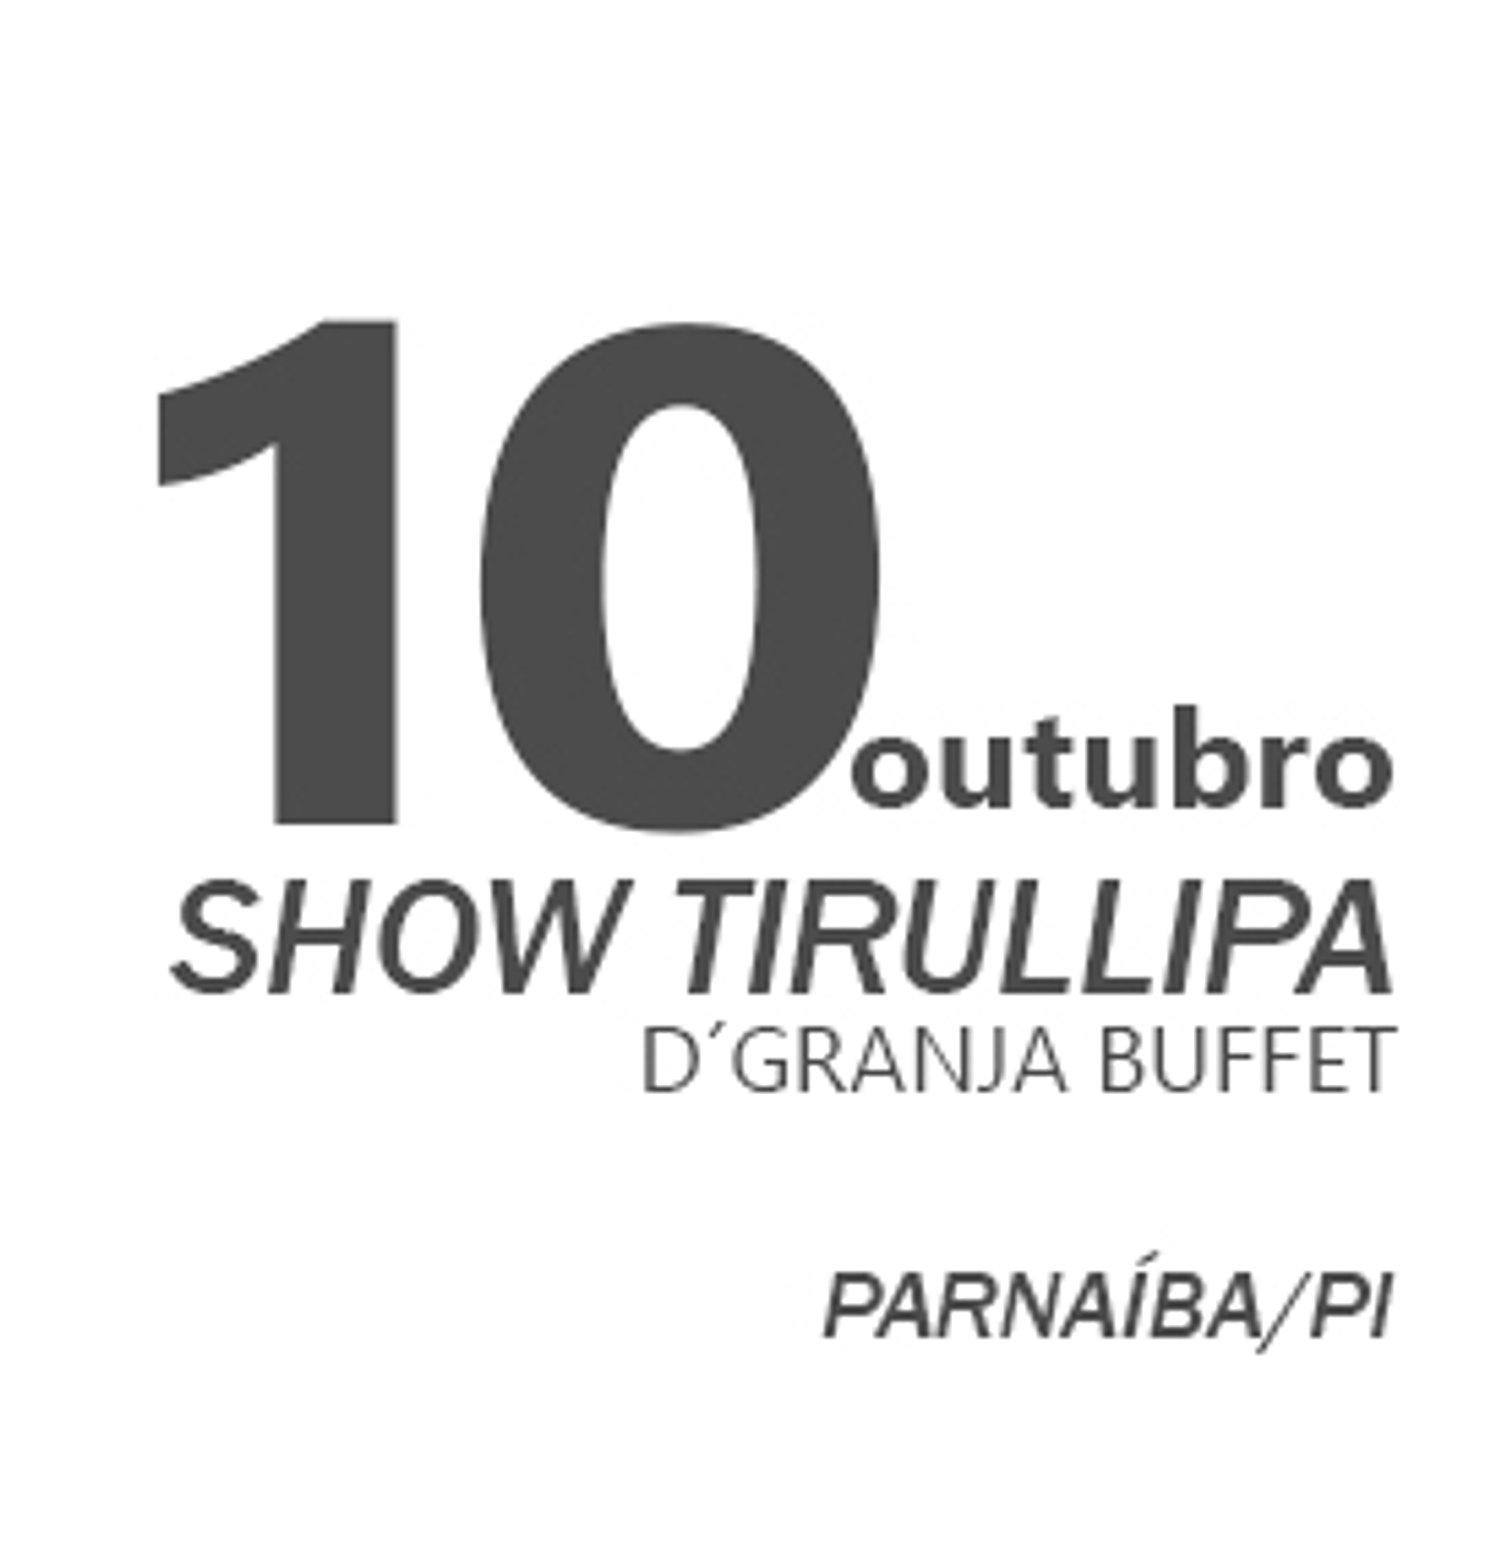 TIRULLIPA EM PARNAÍBA/PI